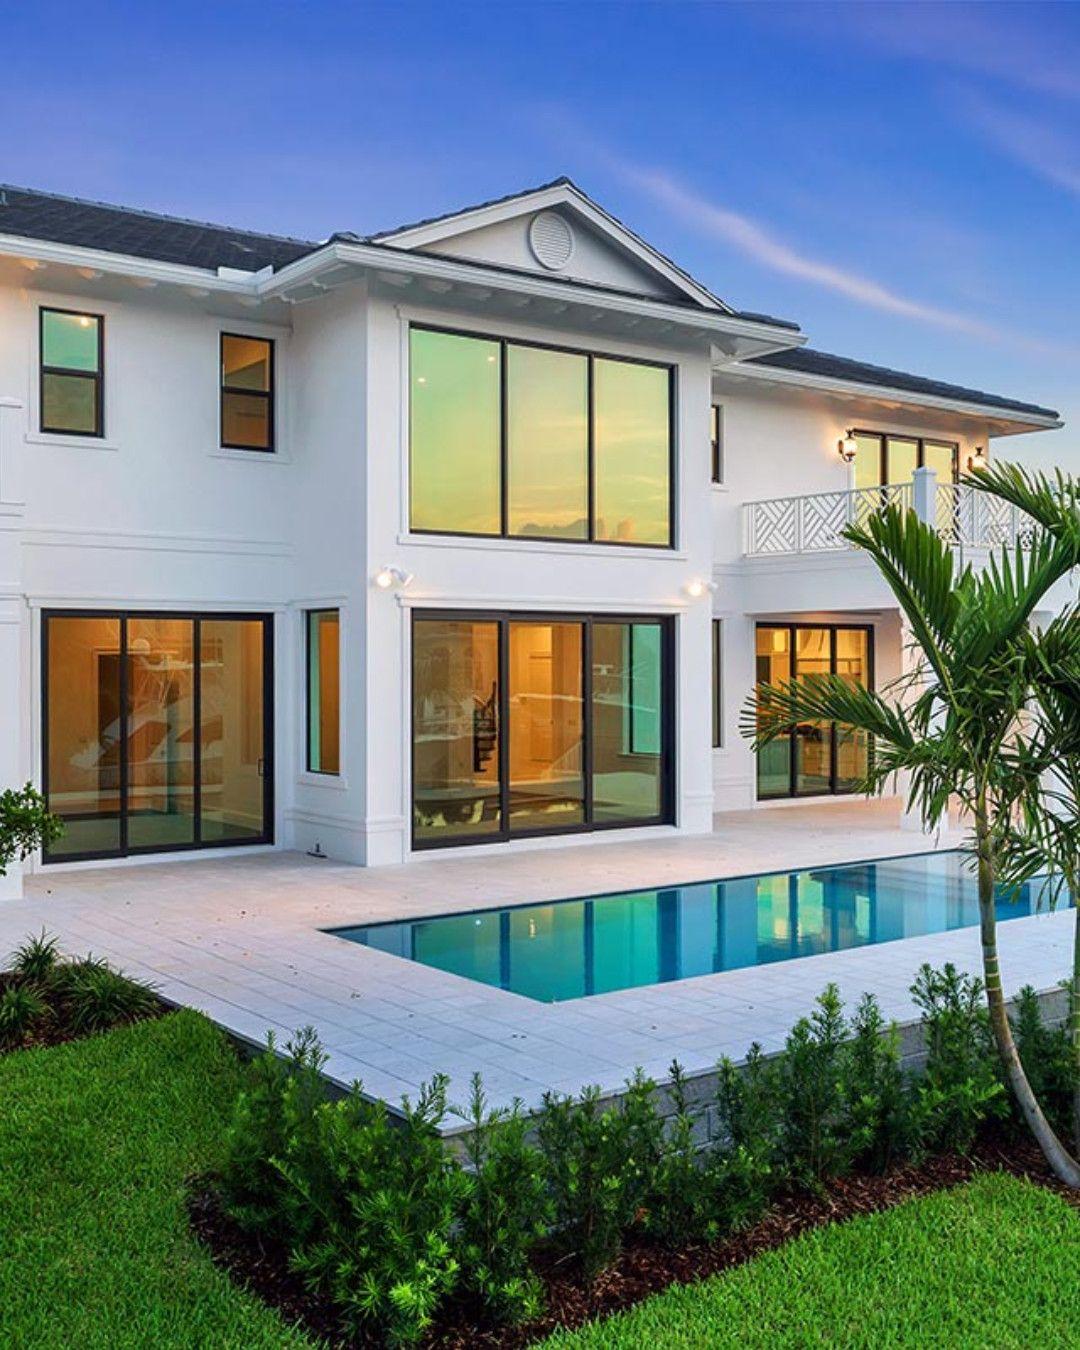 618201c85de8e542b5b563d85f5f129e - New Construction Houses In Palm Beach Gardens